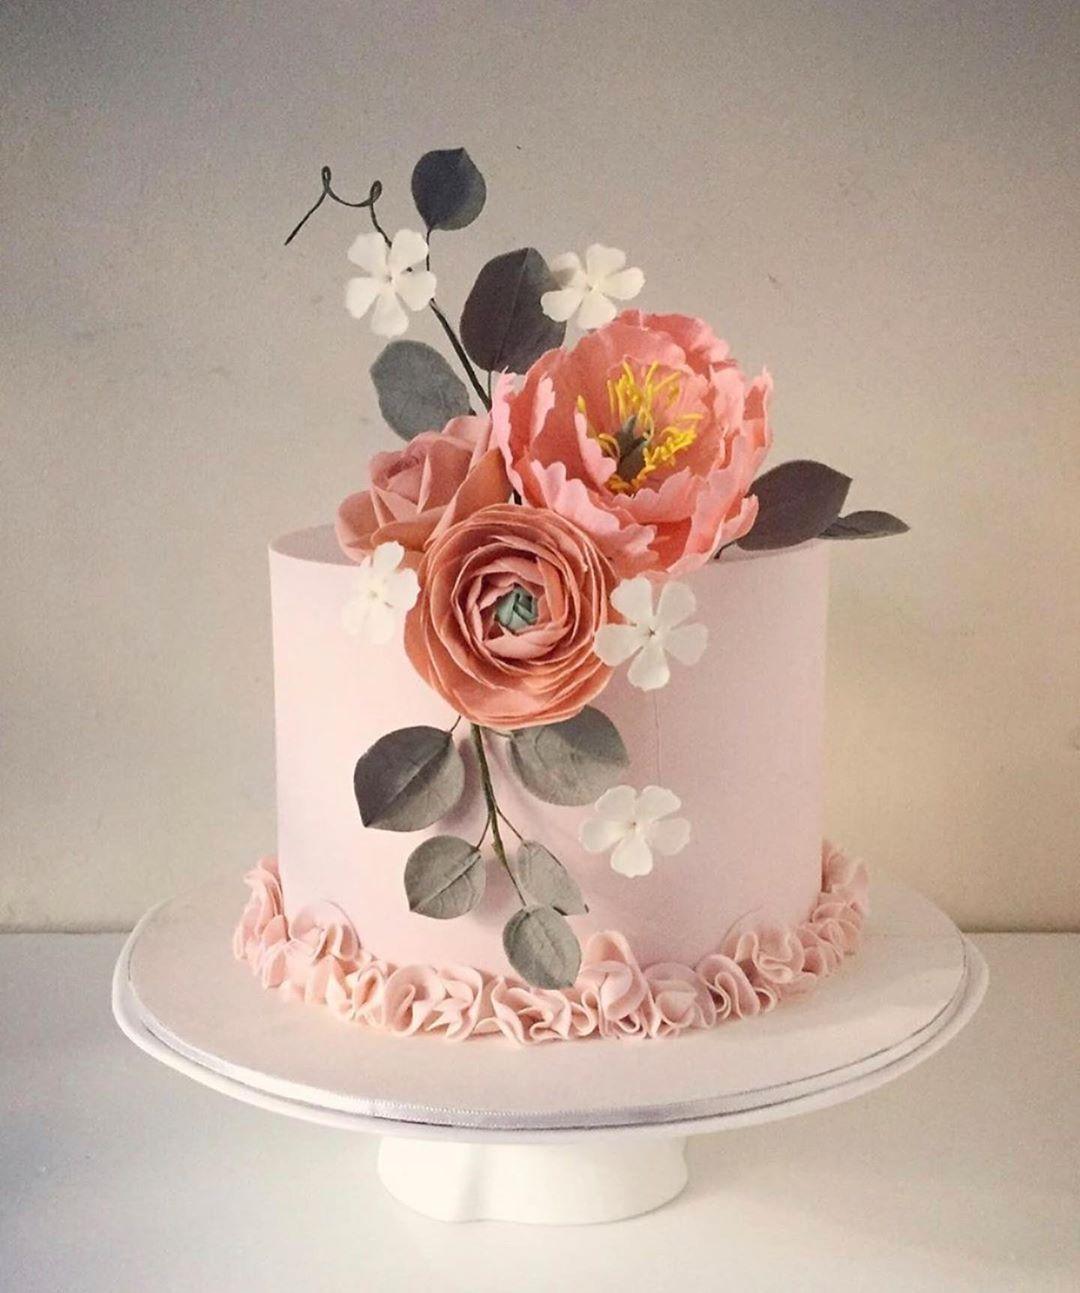 "❤️ on Instagram: ""🎂💝 Follow: @themabaker 🍰 🍰 🍰 #cake #cakes #cakedecorating #cakeideas #cakeart #cooking #ricepaper #bestcake #cakeintrend #mastic…"""